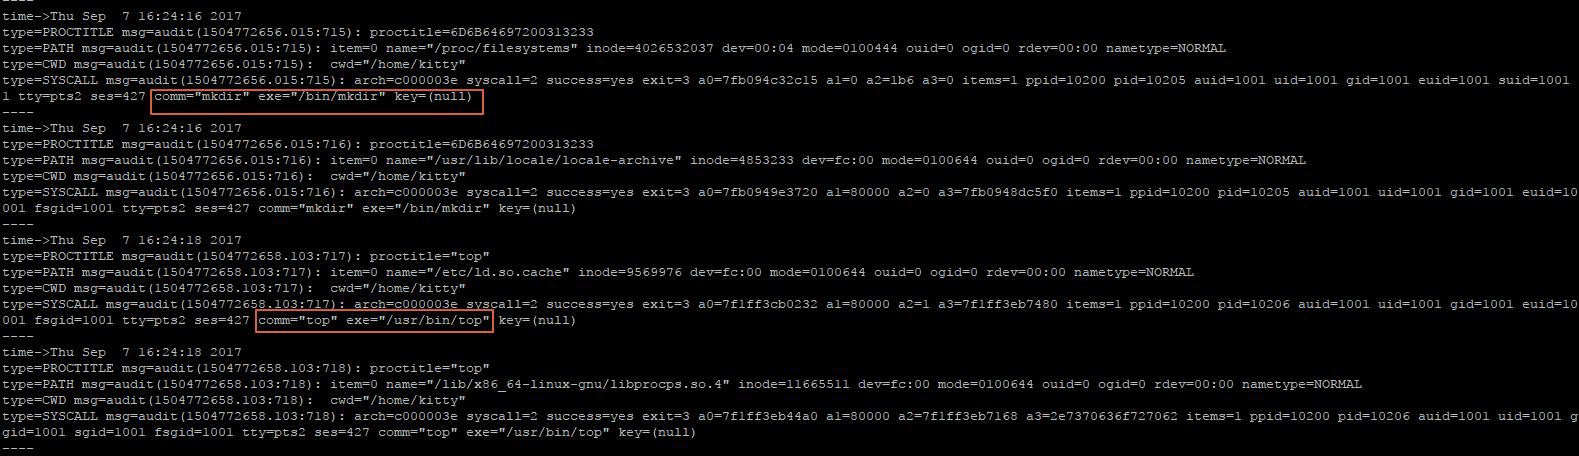 Sun / Solaris 筆記: Ubuntu 16 04 LTS Audit 設定